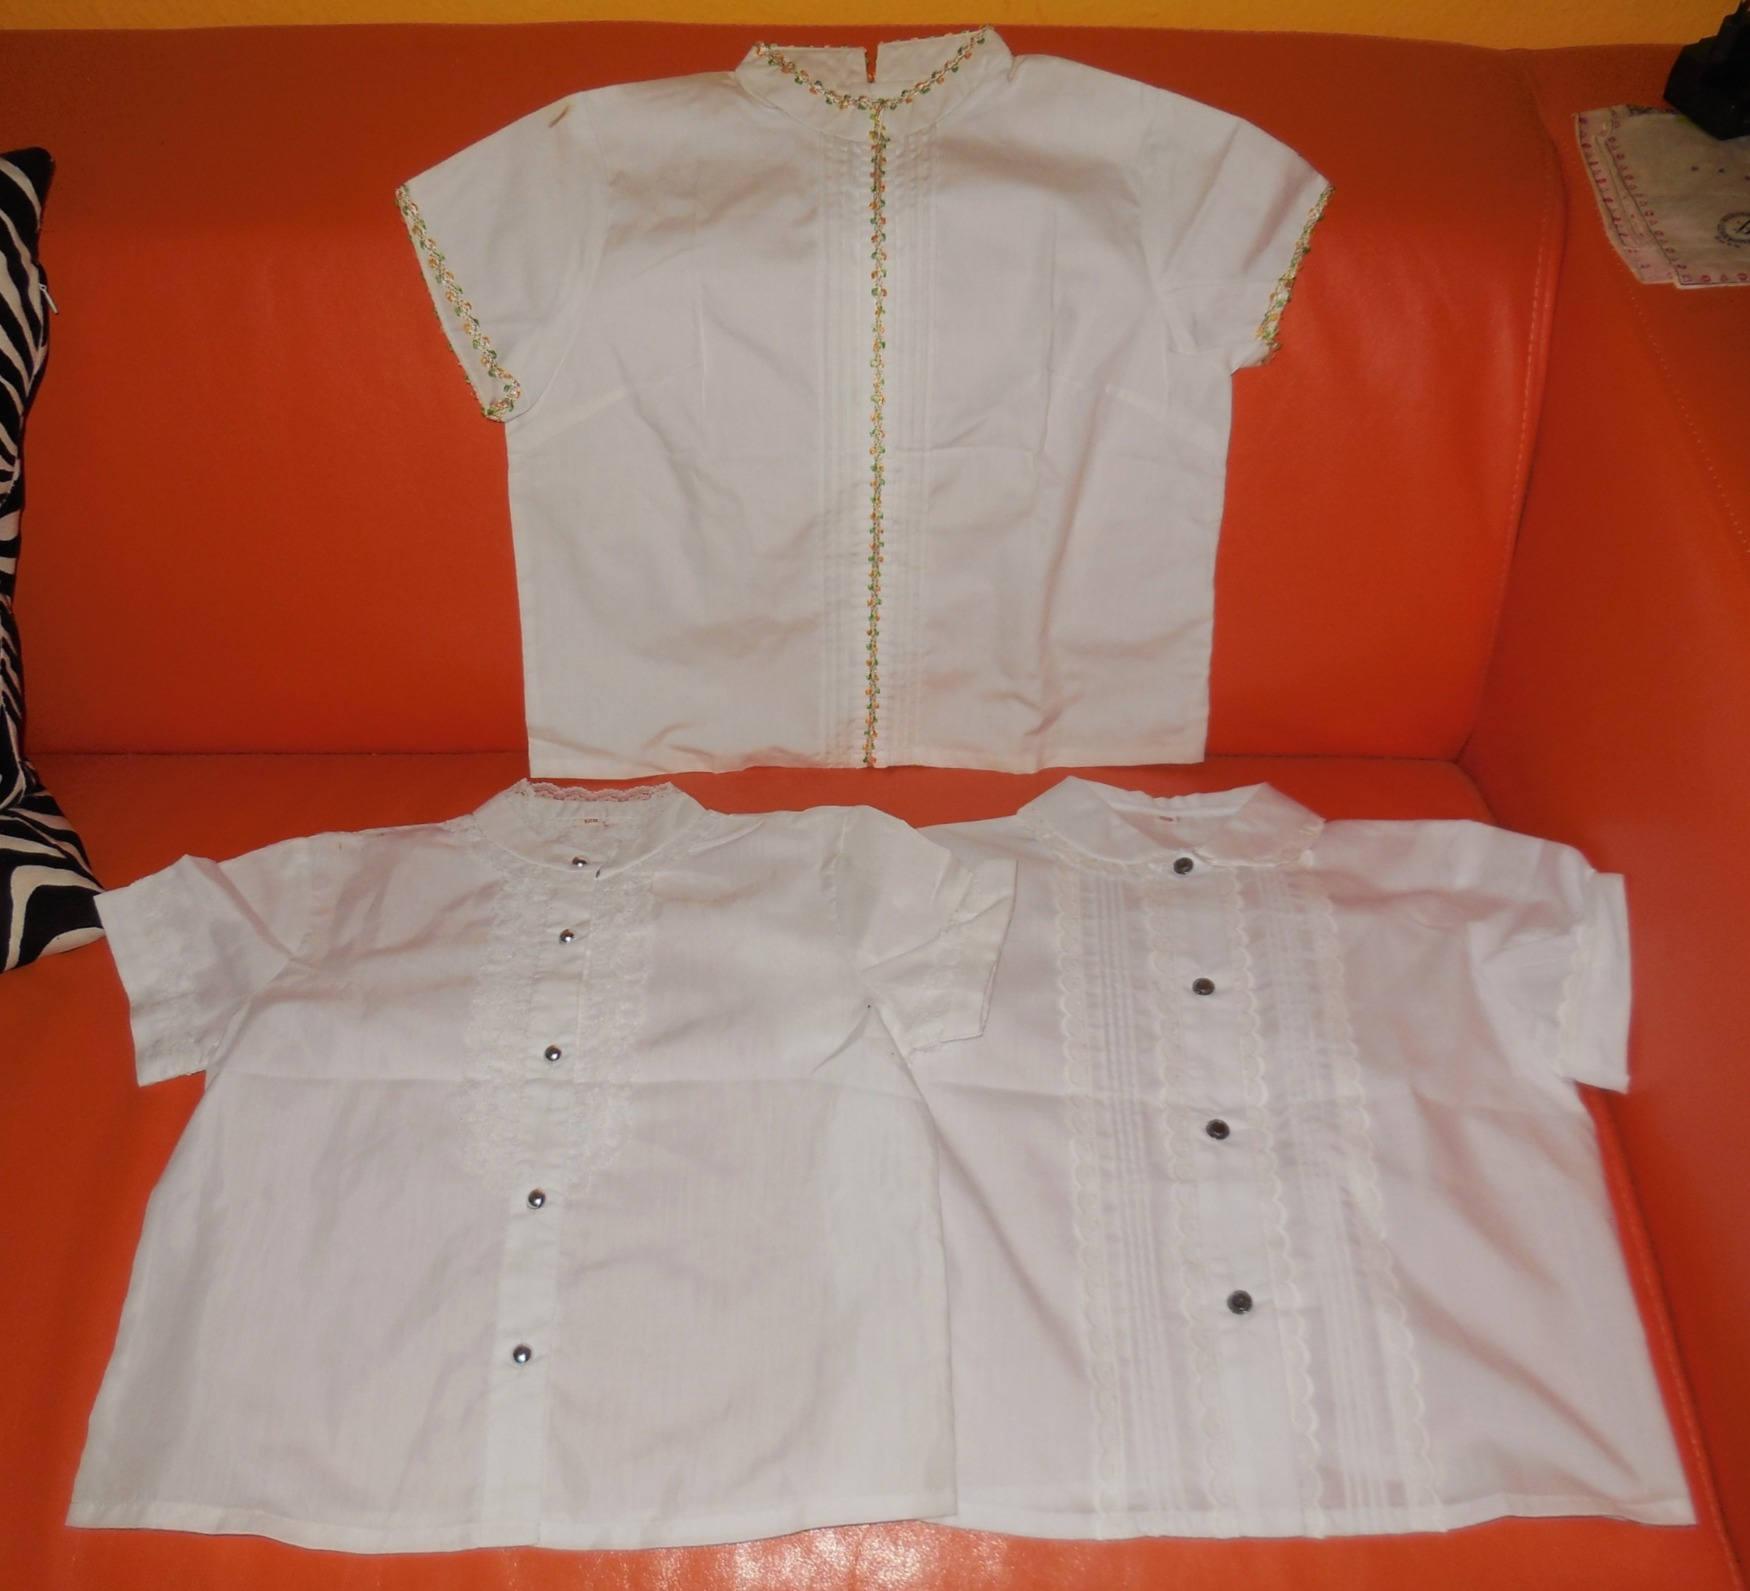 Sale Lot Of 3 Vintage Girls Blouse 1950s 60s White Blouses Cotton